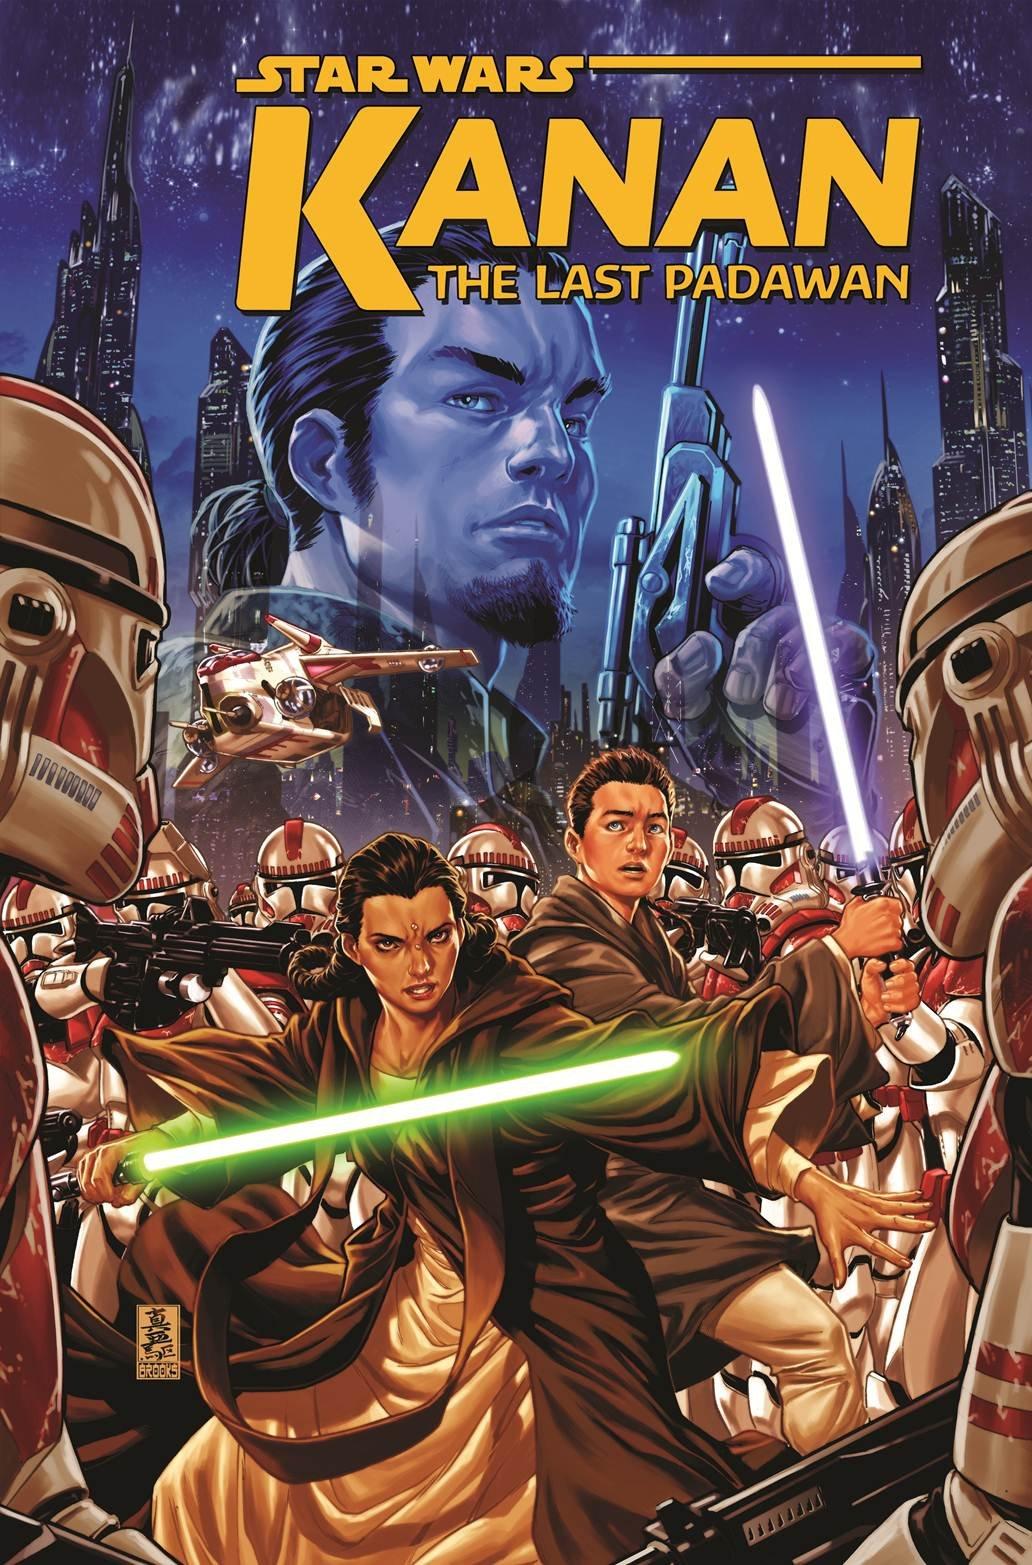 Star Wars: Kanan Book I: The Last Padawan | Wookieepedia ...